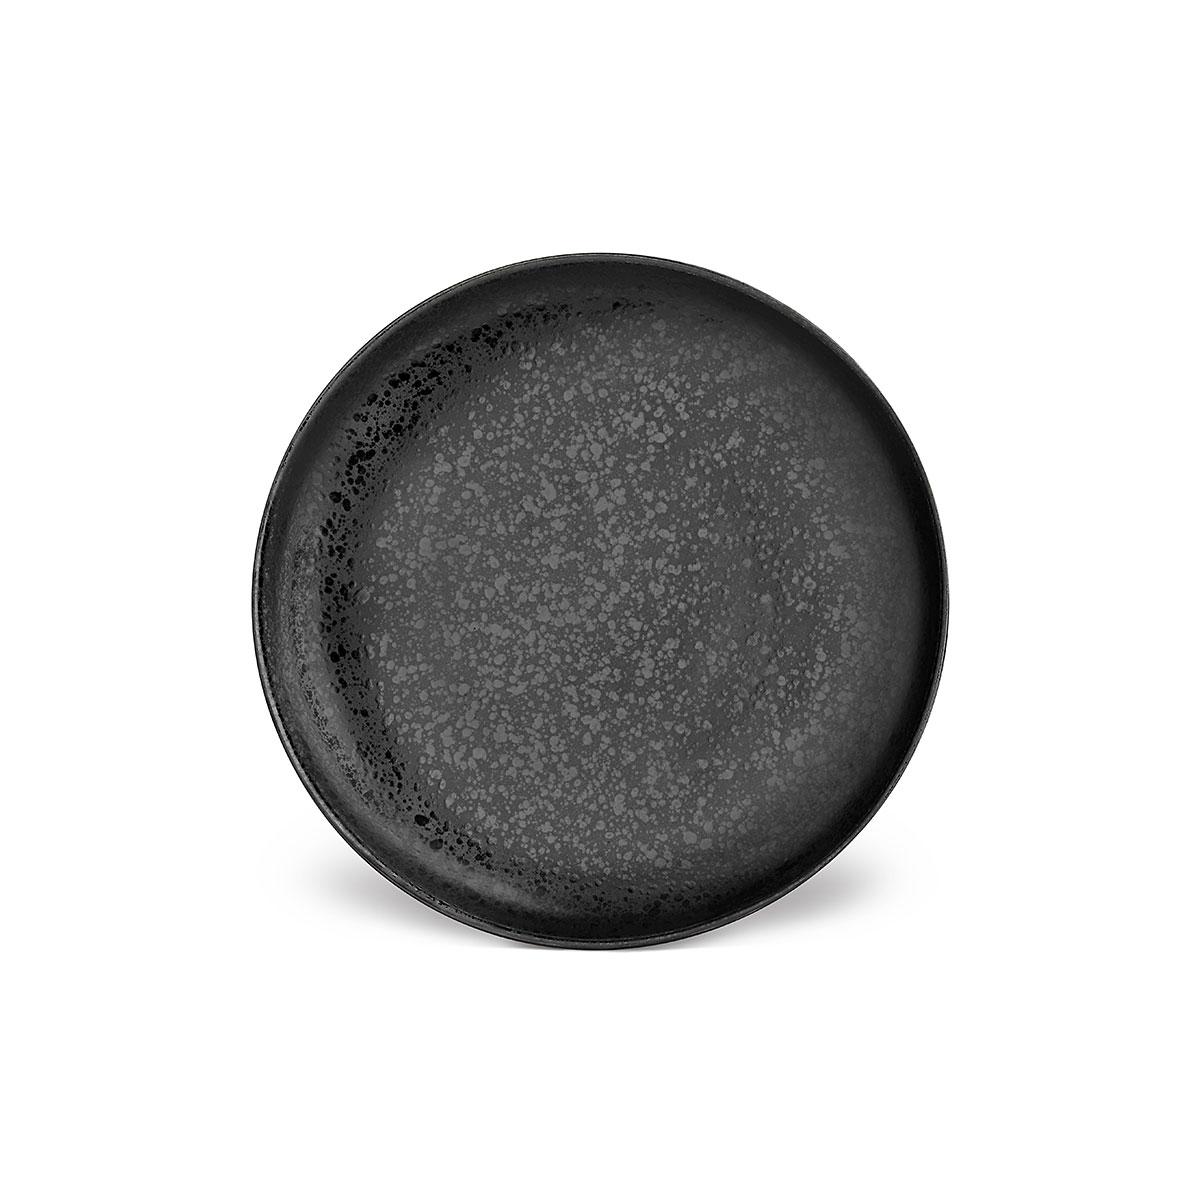 L'Objet I Alchimie Dinner Plate Black